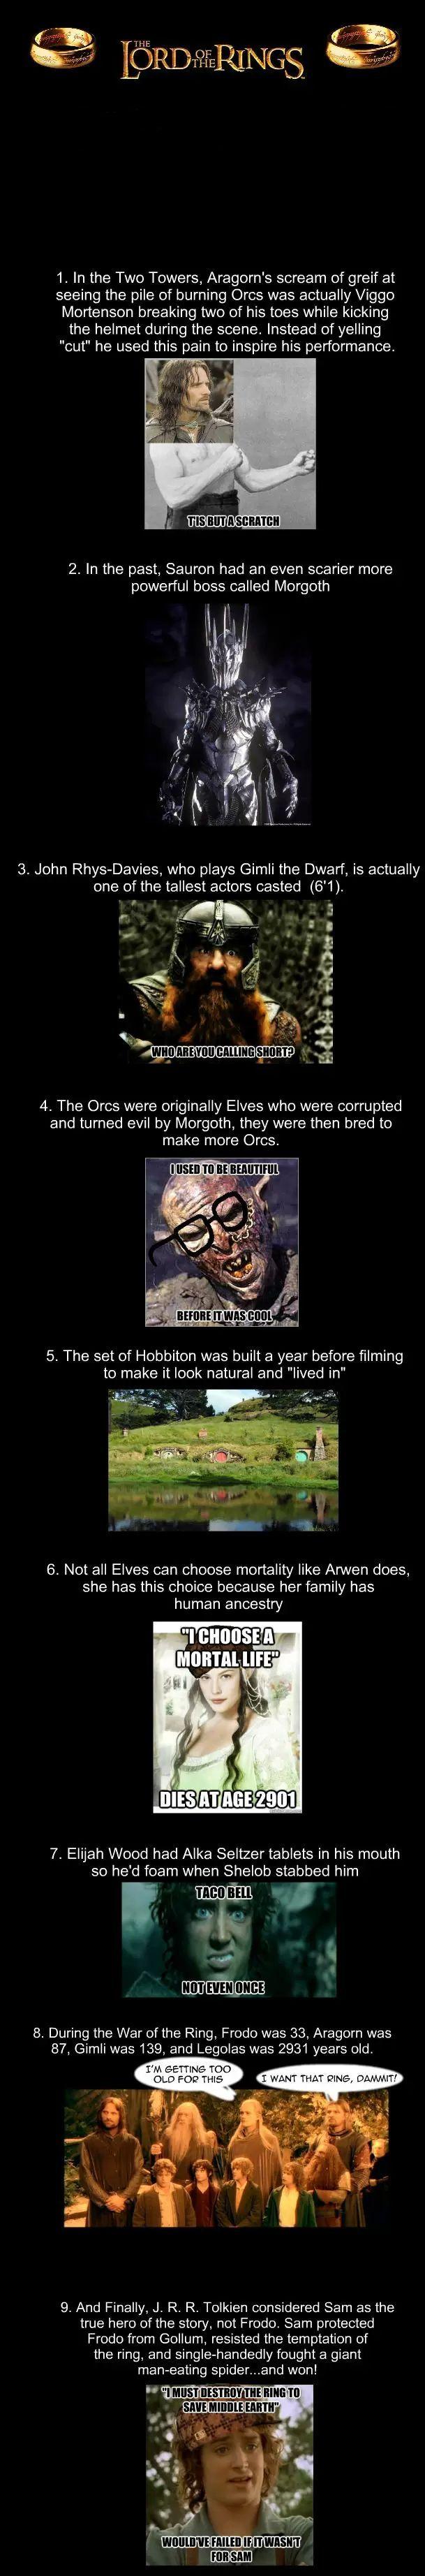 Love movie trivia!